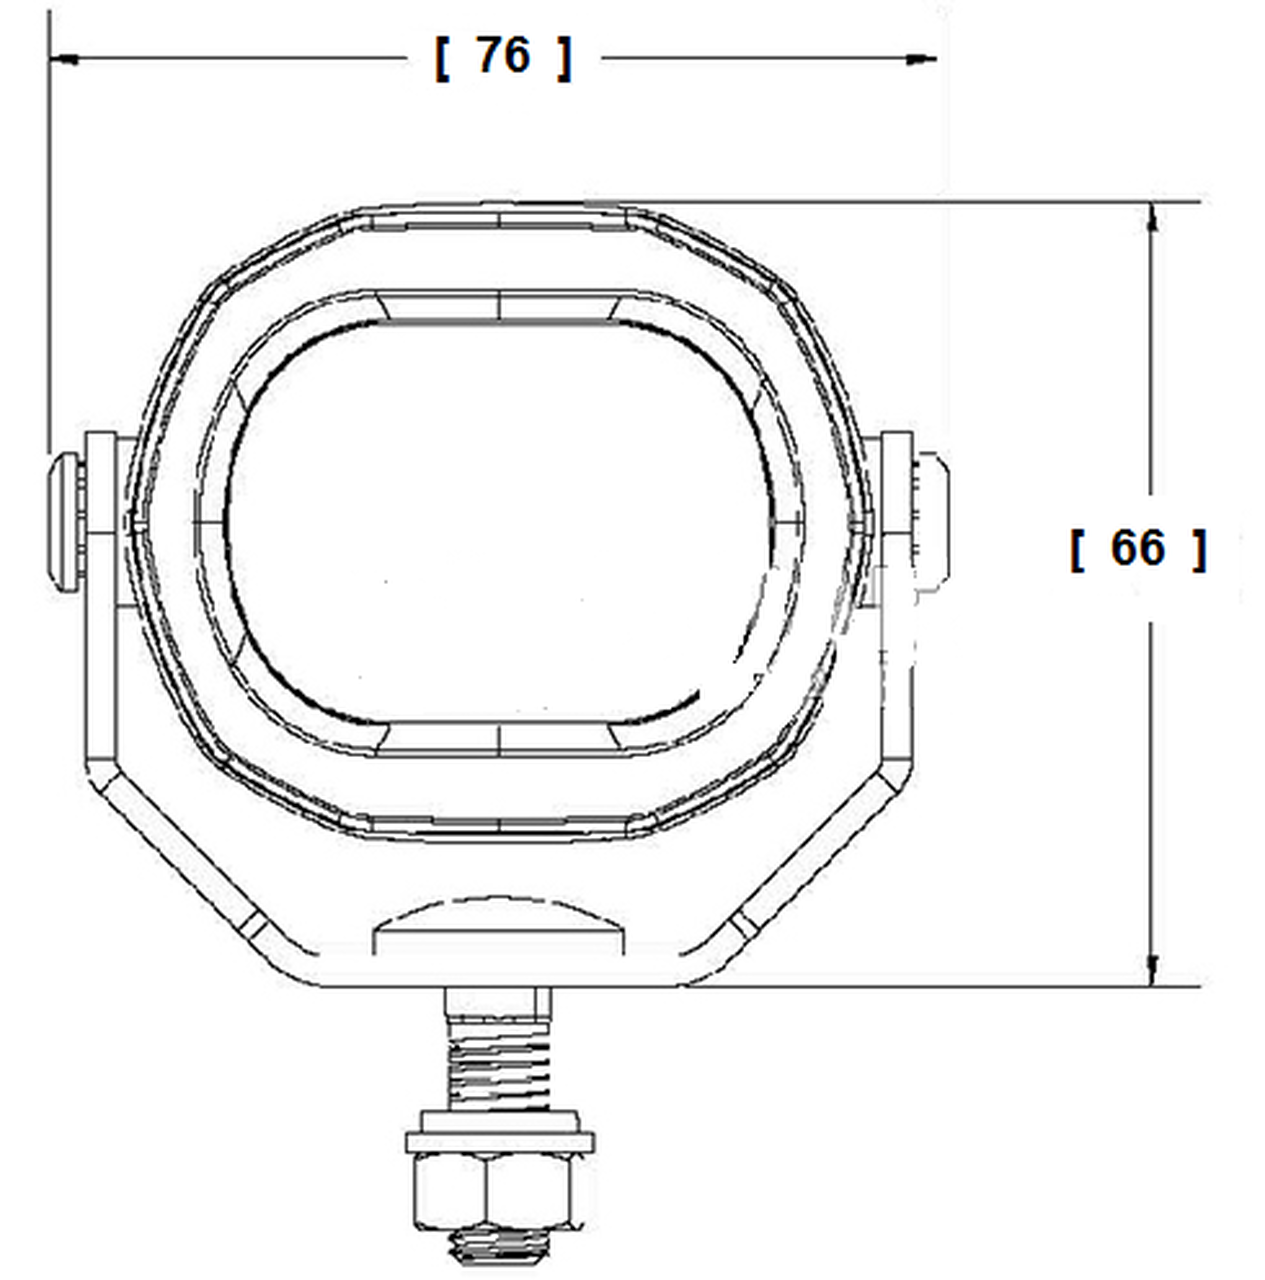 Dimension: 66 x 76 x 67mm